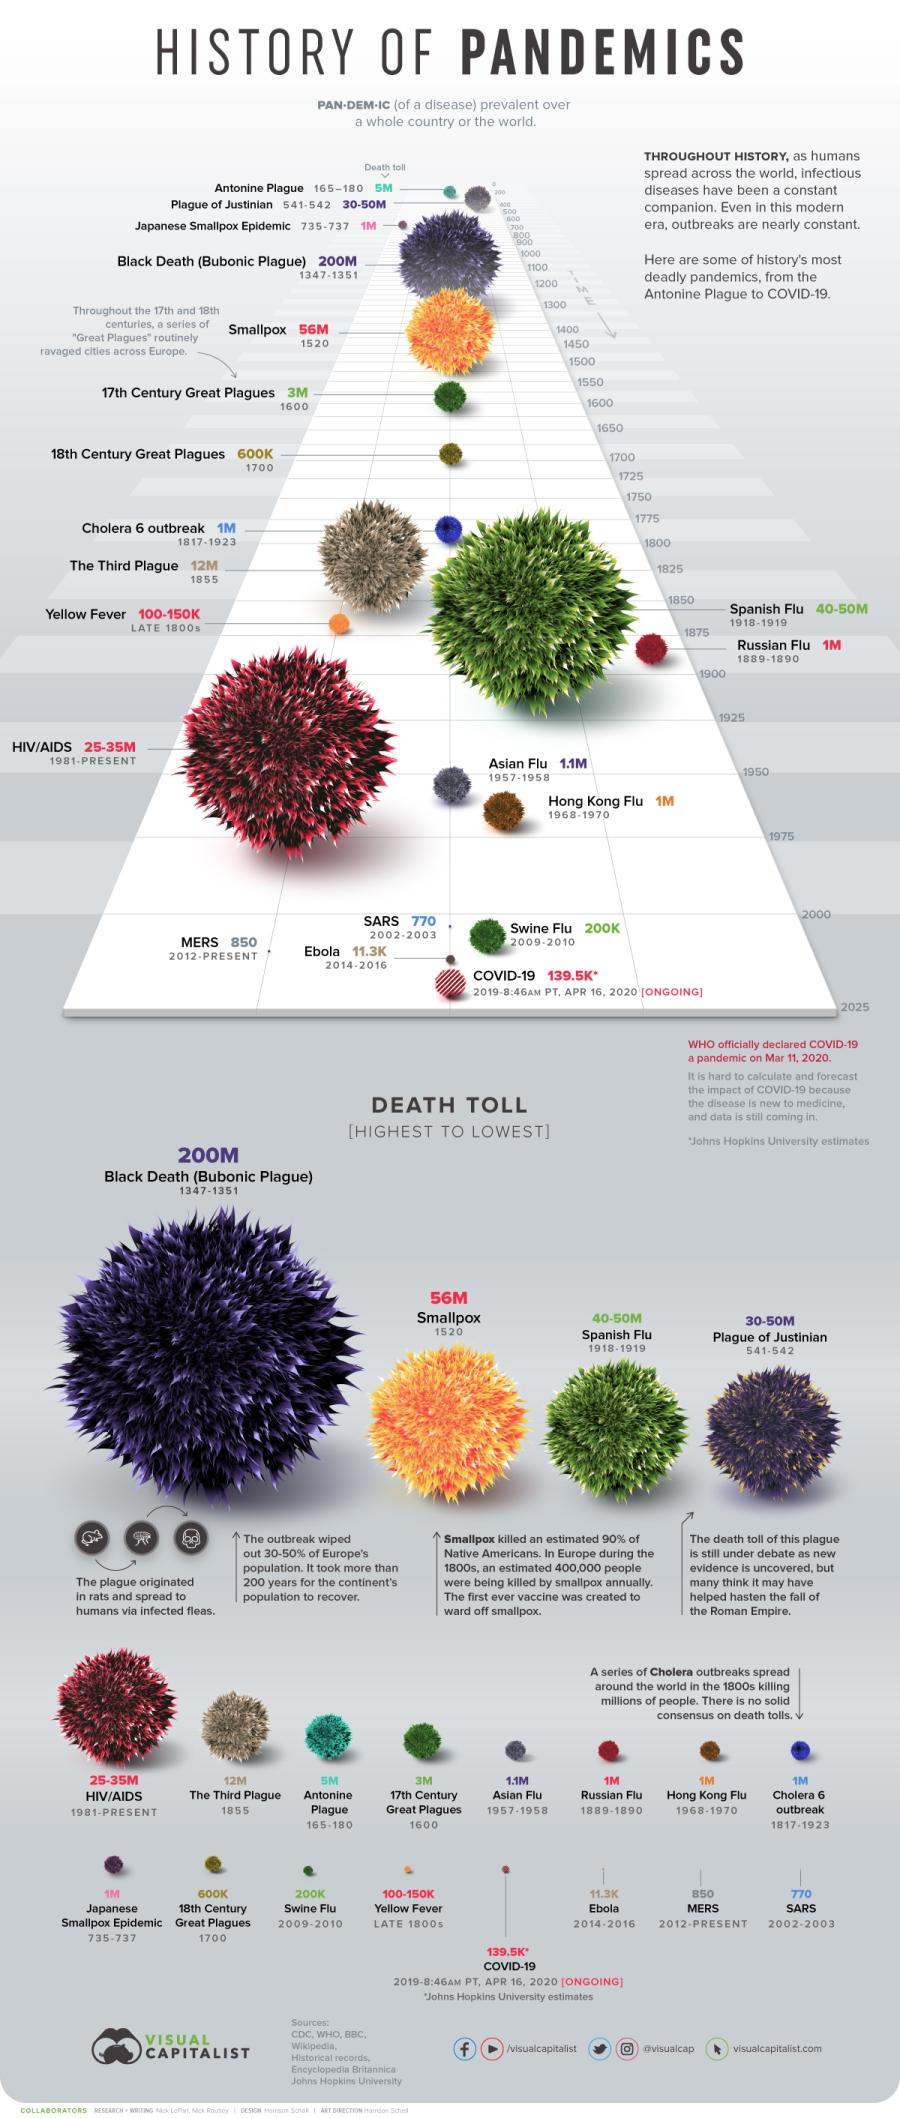 DeadliestPandemics-Infographic-34